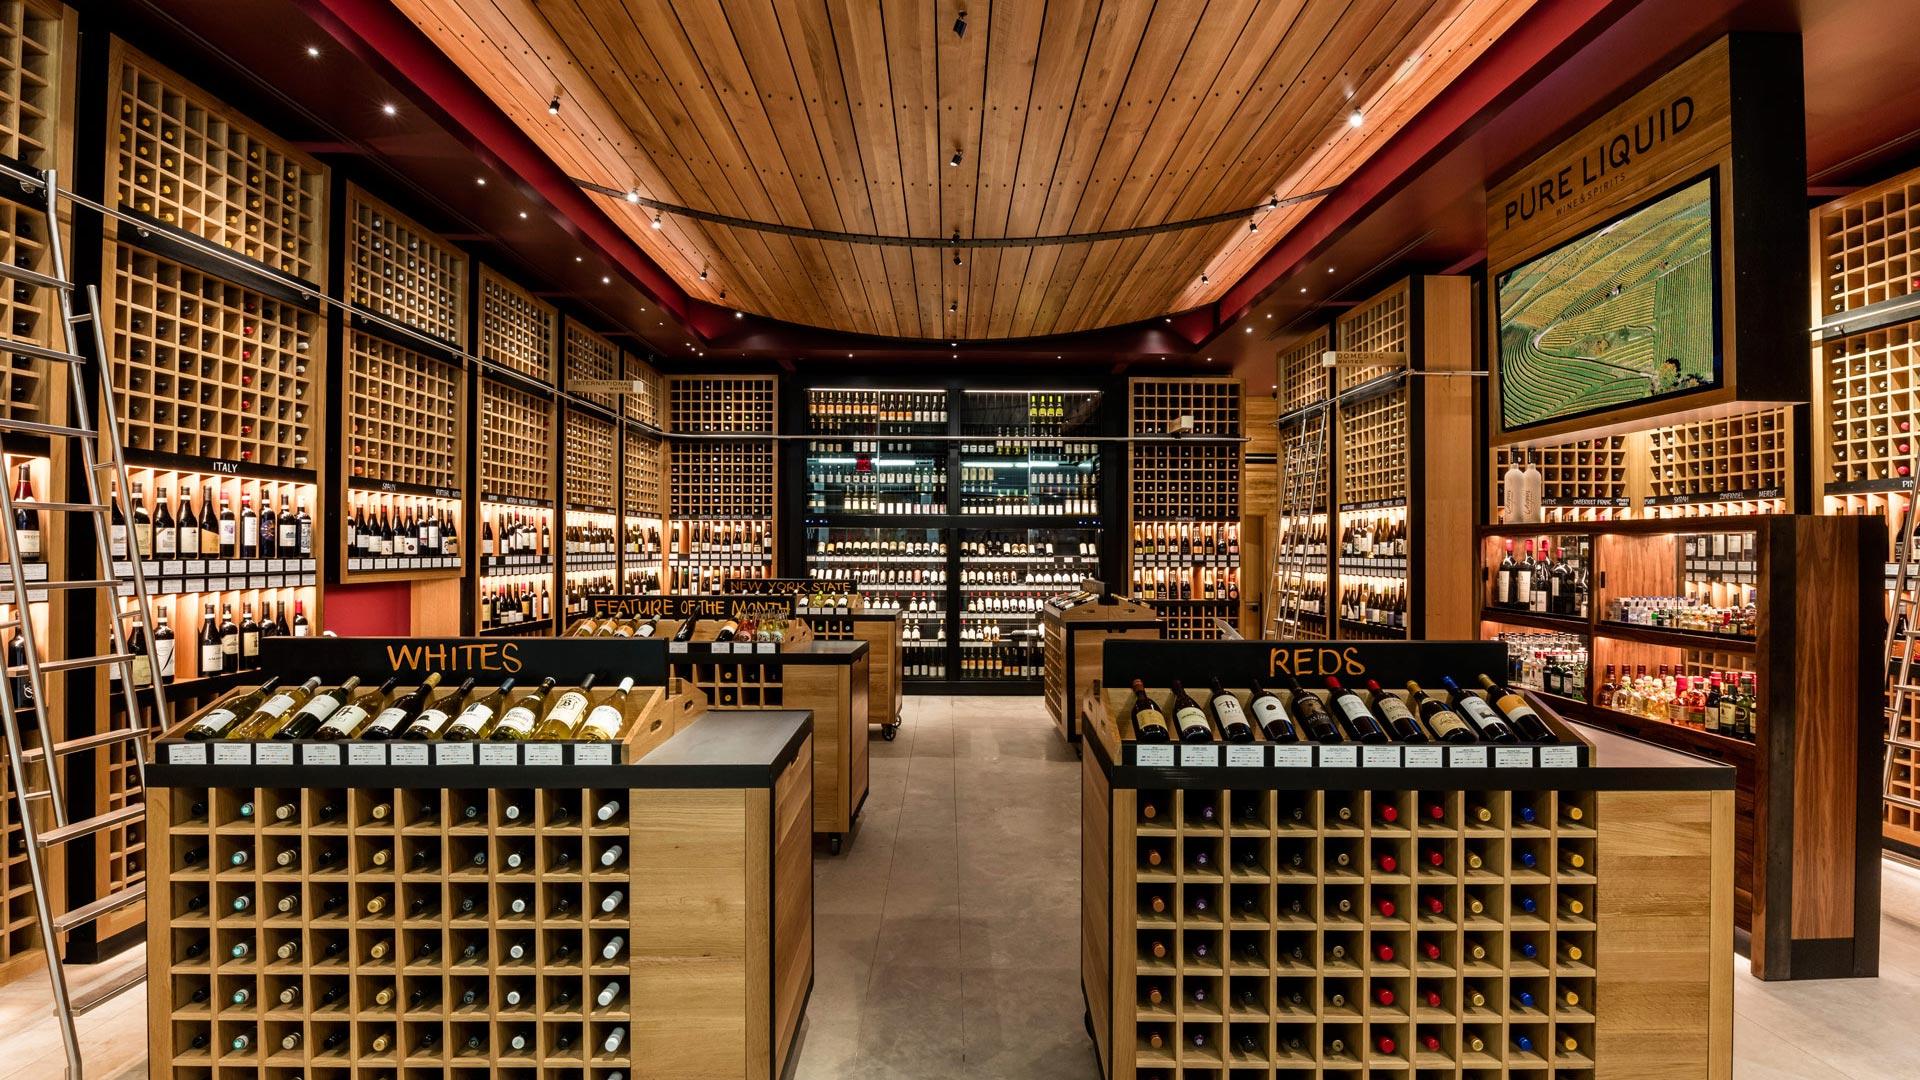 Pure Liquid Wine & Spirits